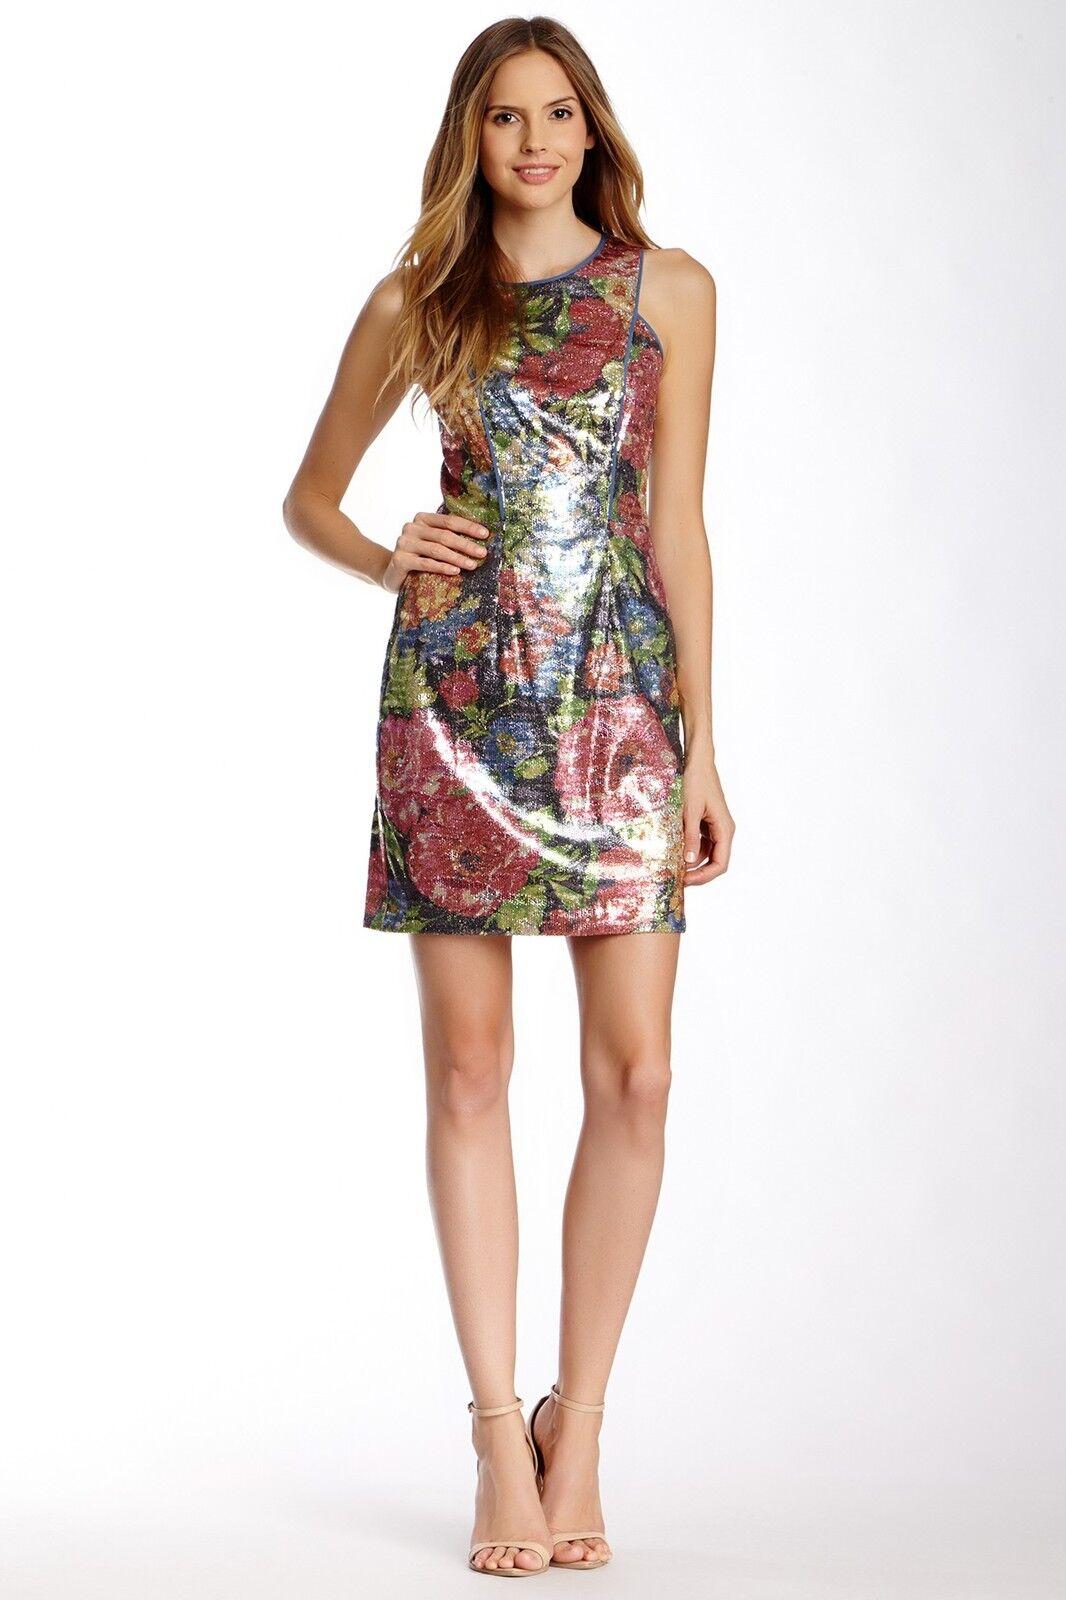 Jessica Simpson Ärmellos Ärmellos Ärmellos Pailletten Kleid Sz 10 Nwt Indigo Multi a1e251